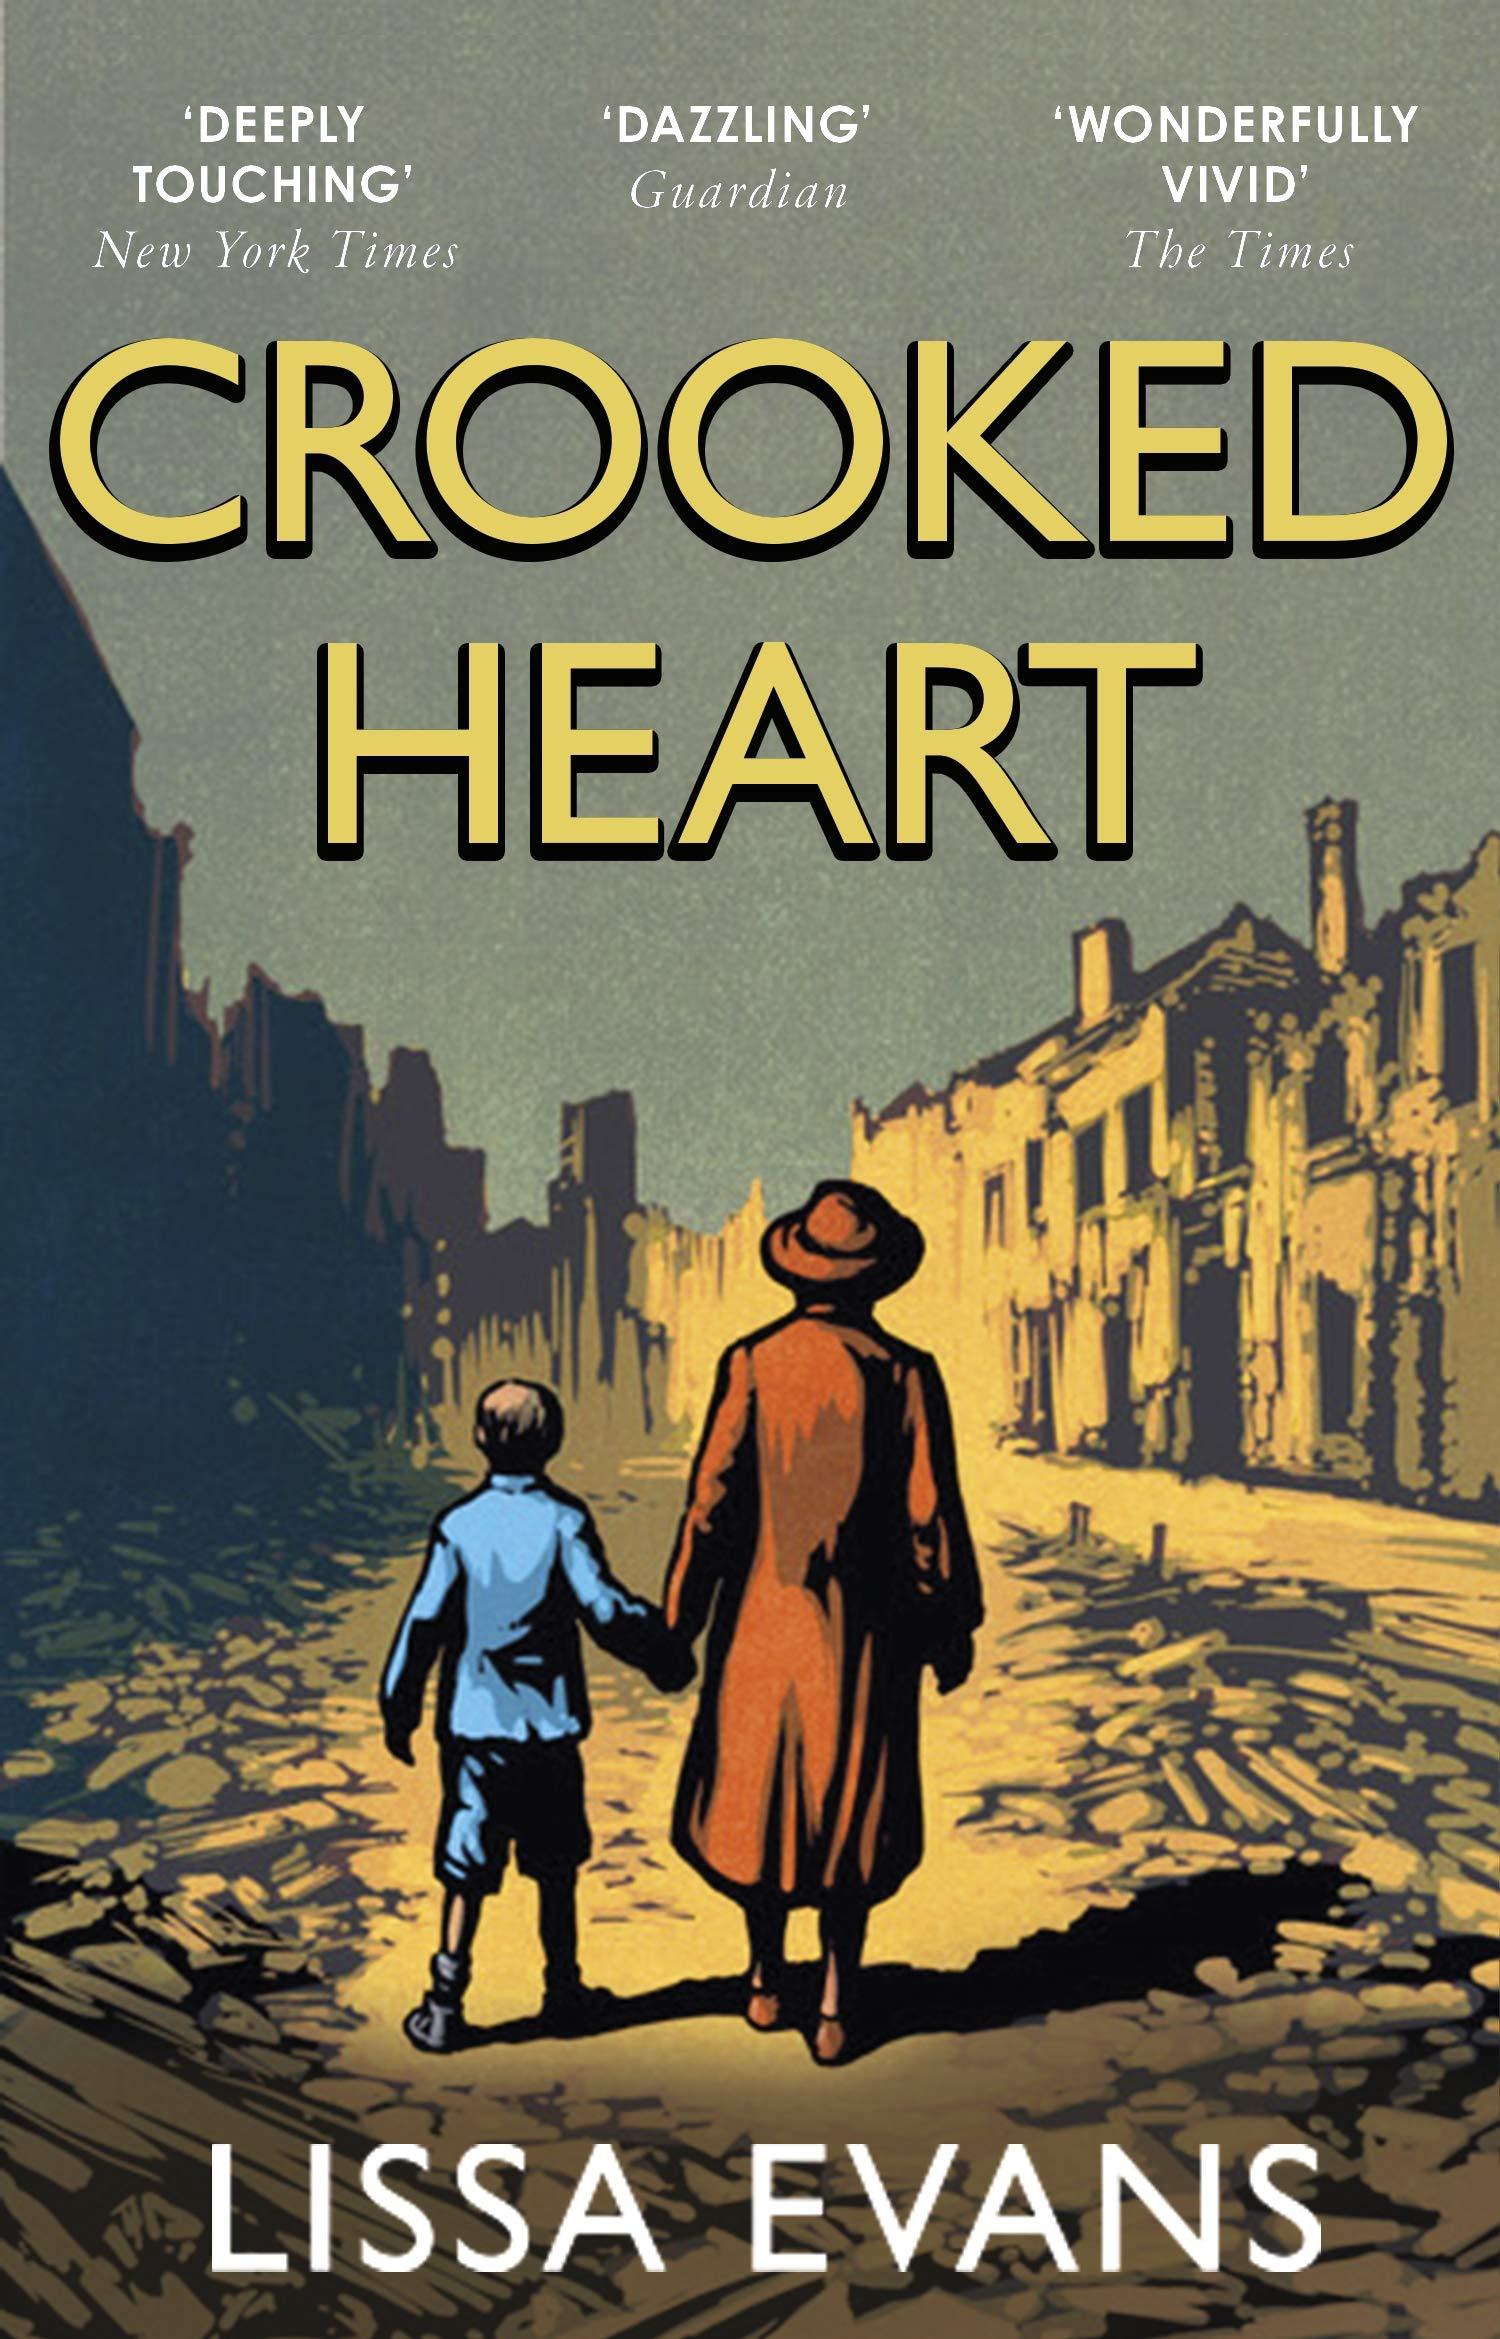 Crooked Heart: 'My book of the year' Jojo Moyes: Amazon.co.uk: Evans, Lissa:  9780552774789: Books